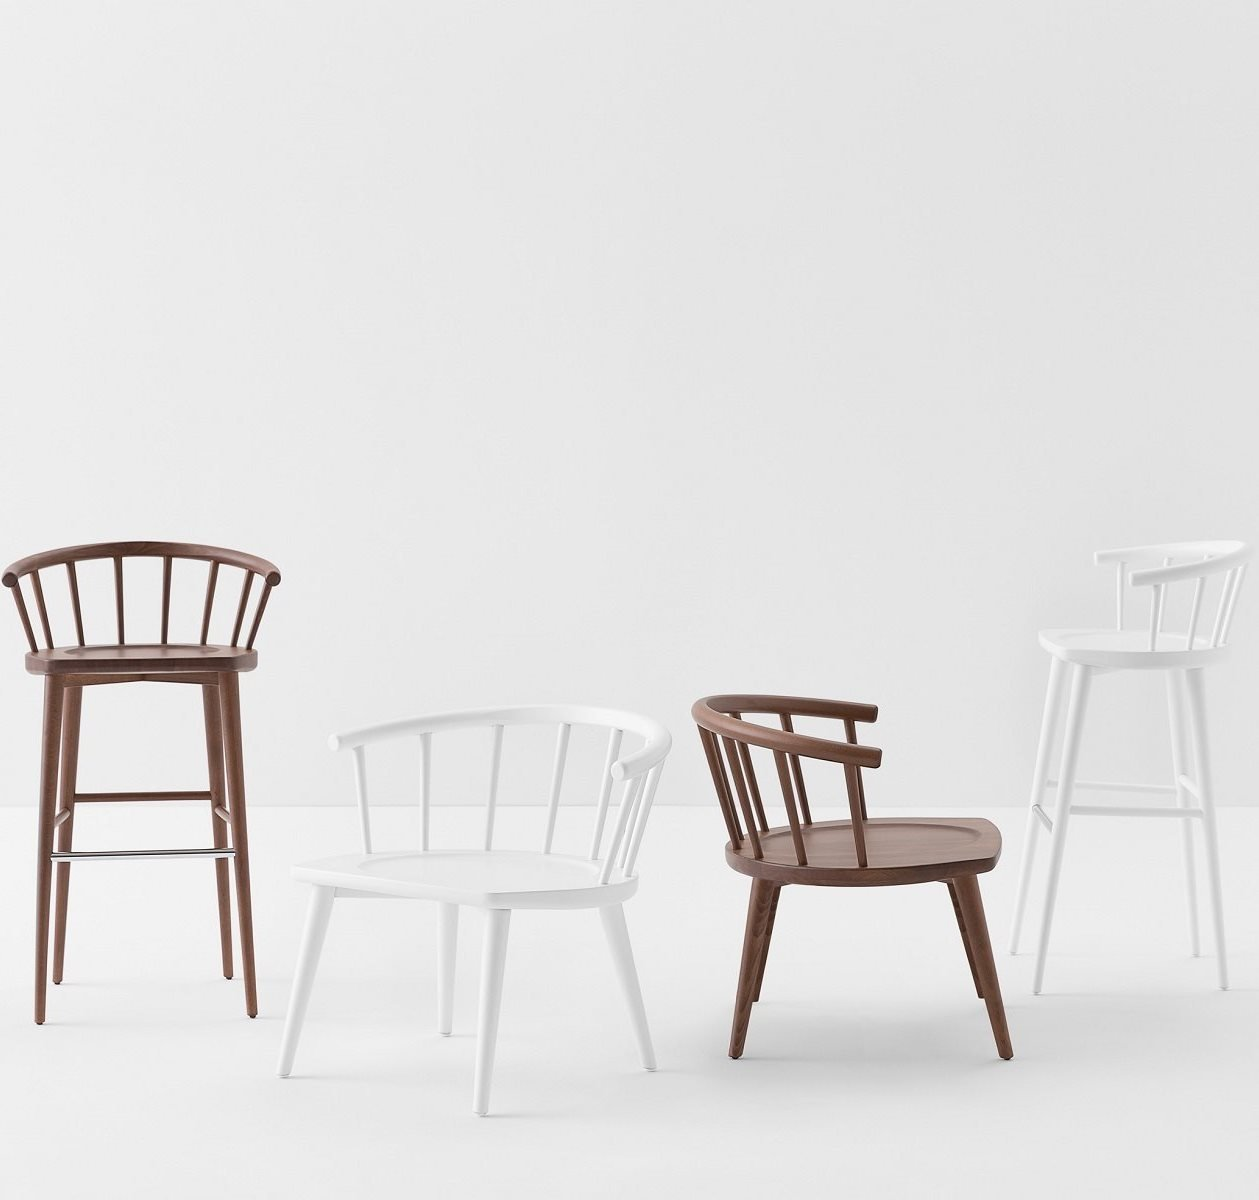 W Lounge Chair from Billiani, designed by Fabrizio Gallinaro